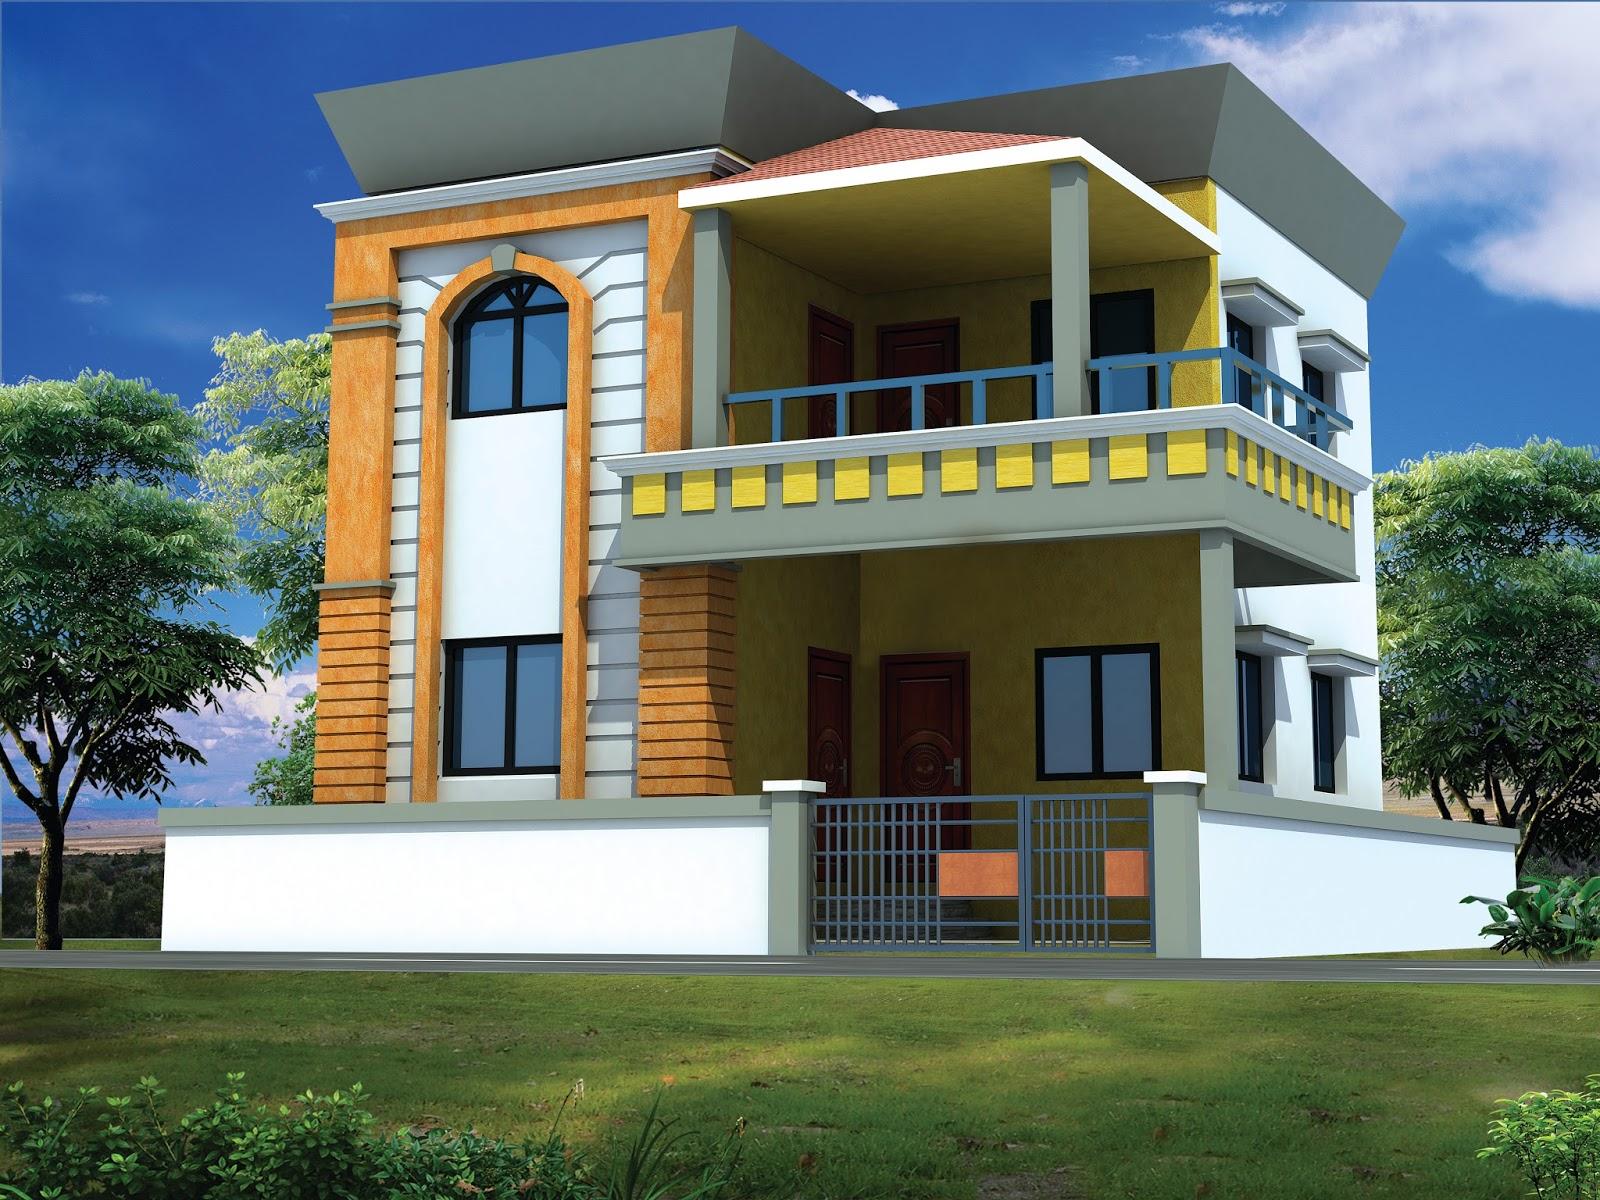 Modern house modern house designs new architecture unique india bunglaw building facade view 3d exterior home concept design